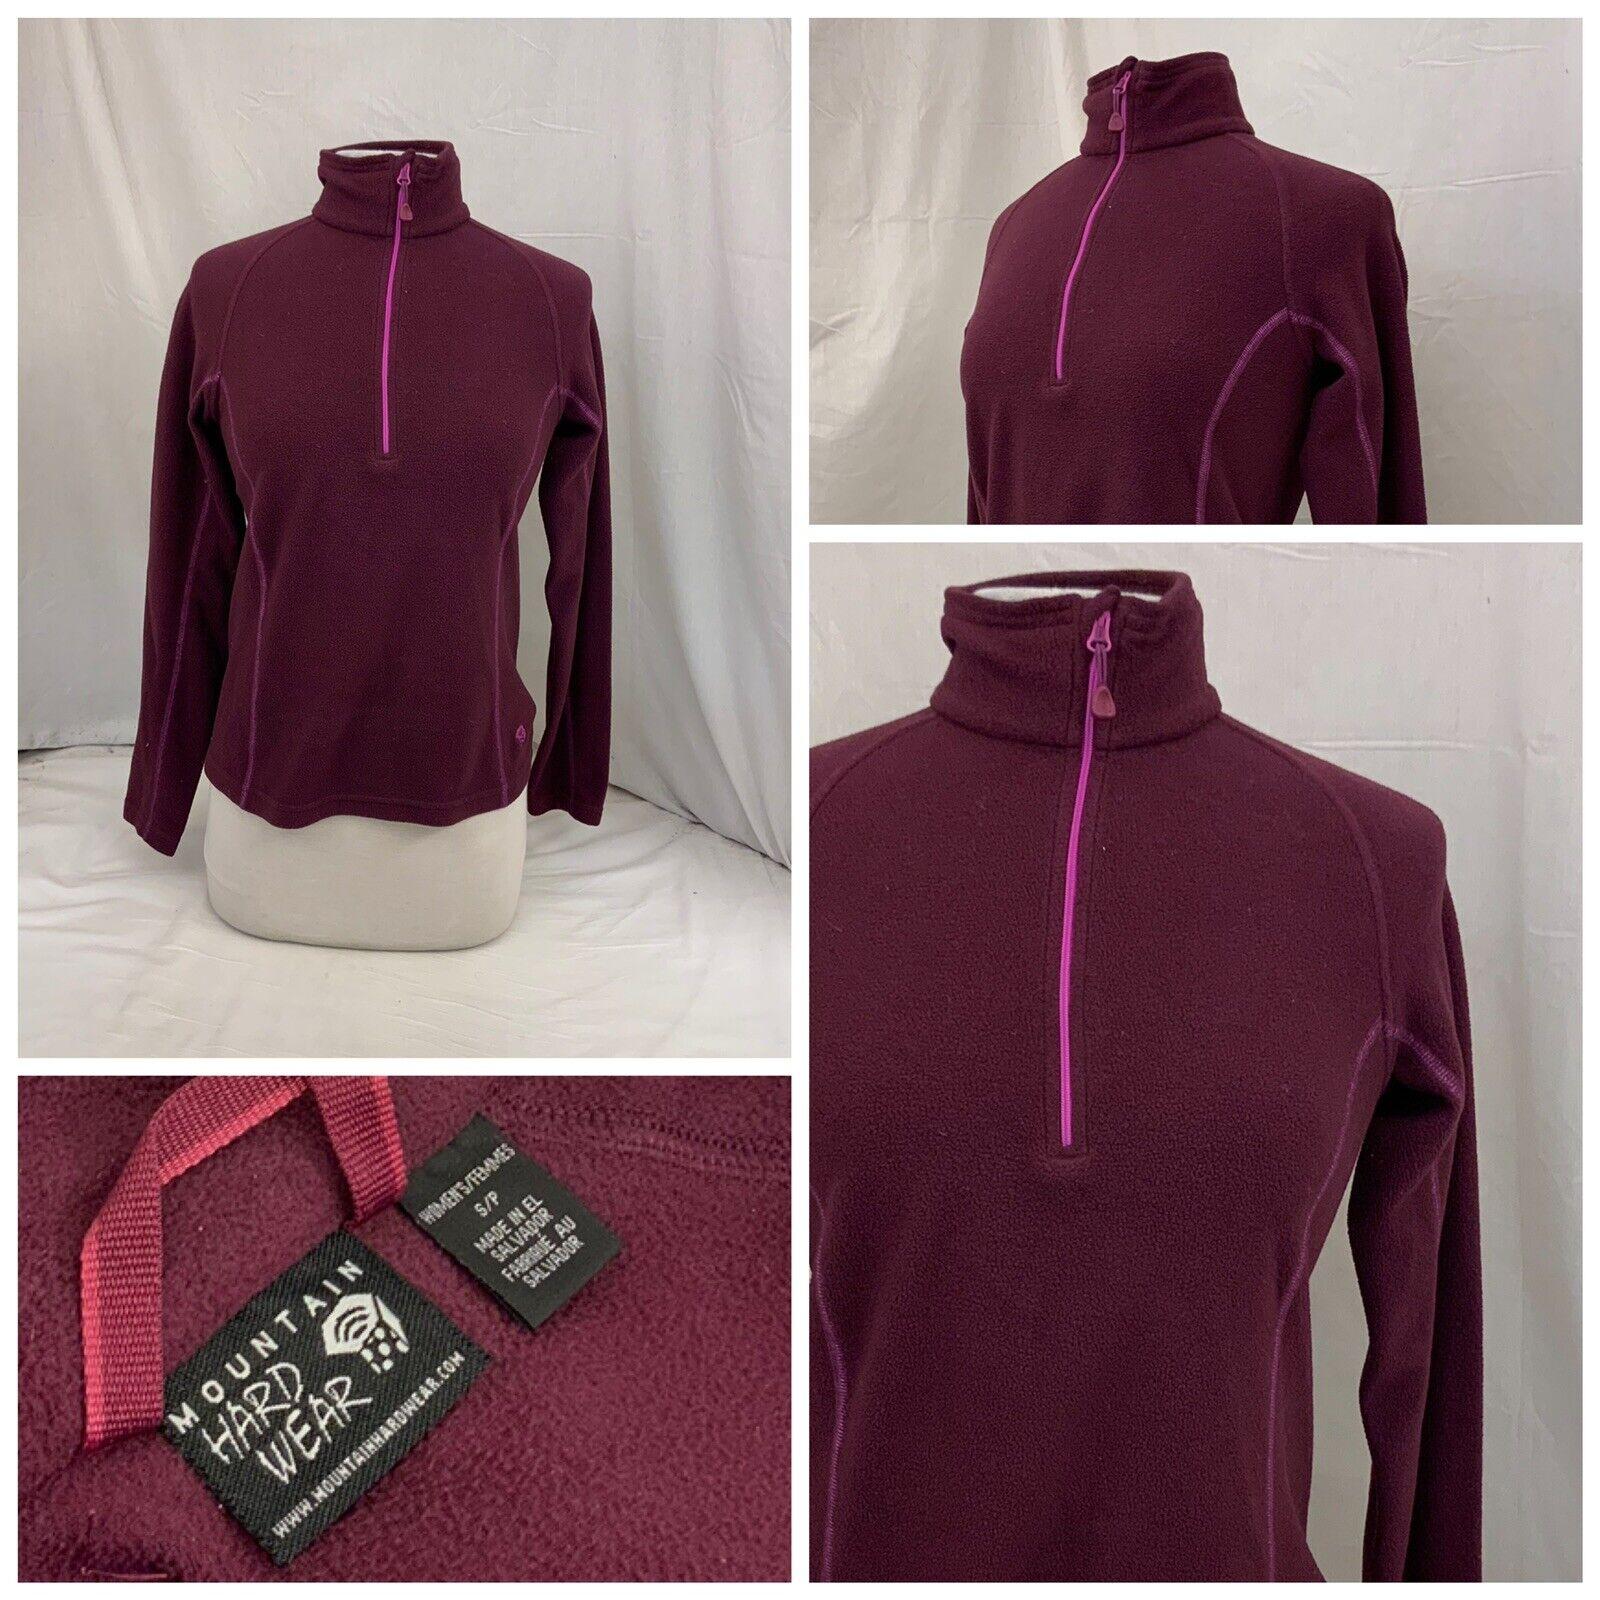 Mountain Hardwear Fleece Pullover S Purple 1/4 Zip EUC YGI W0-528